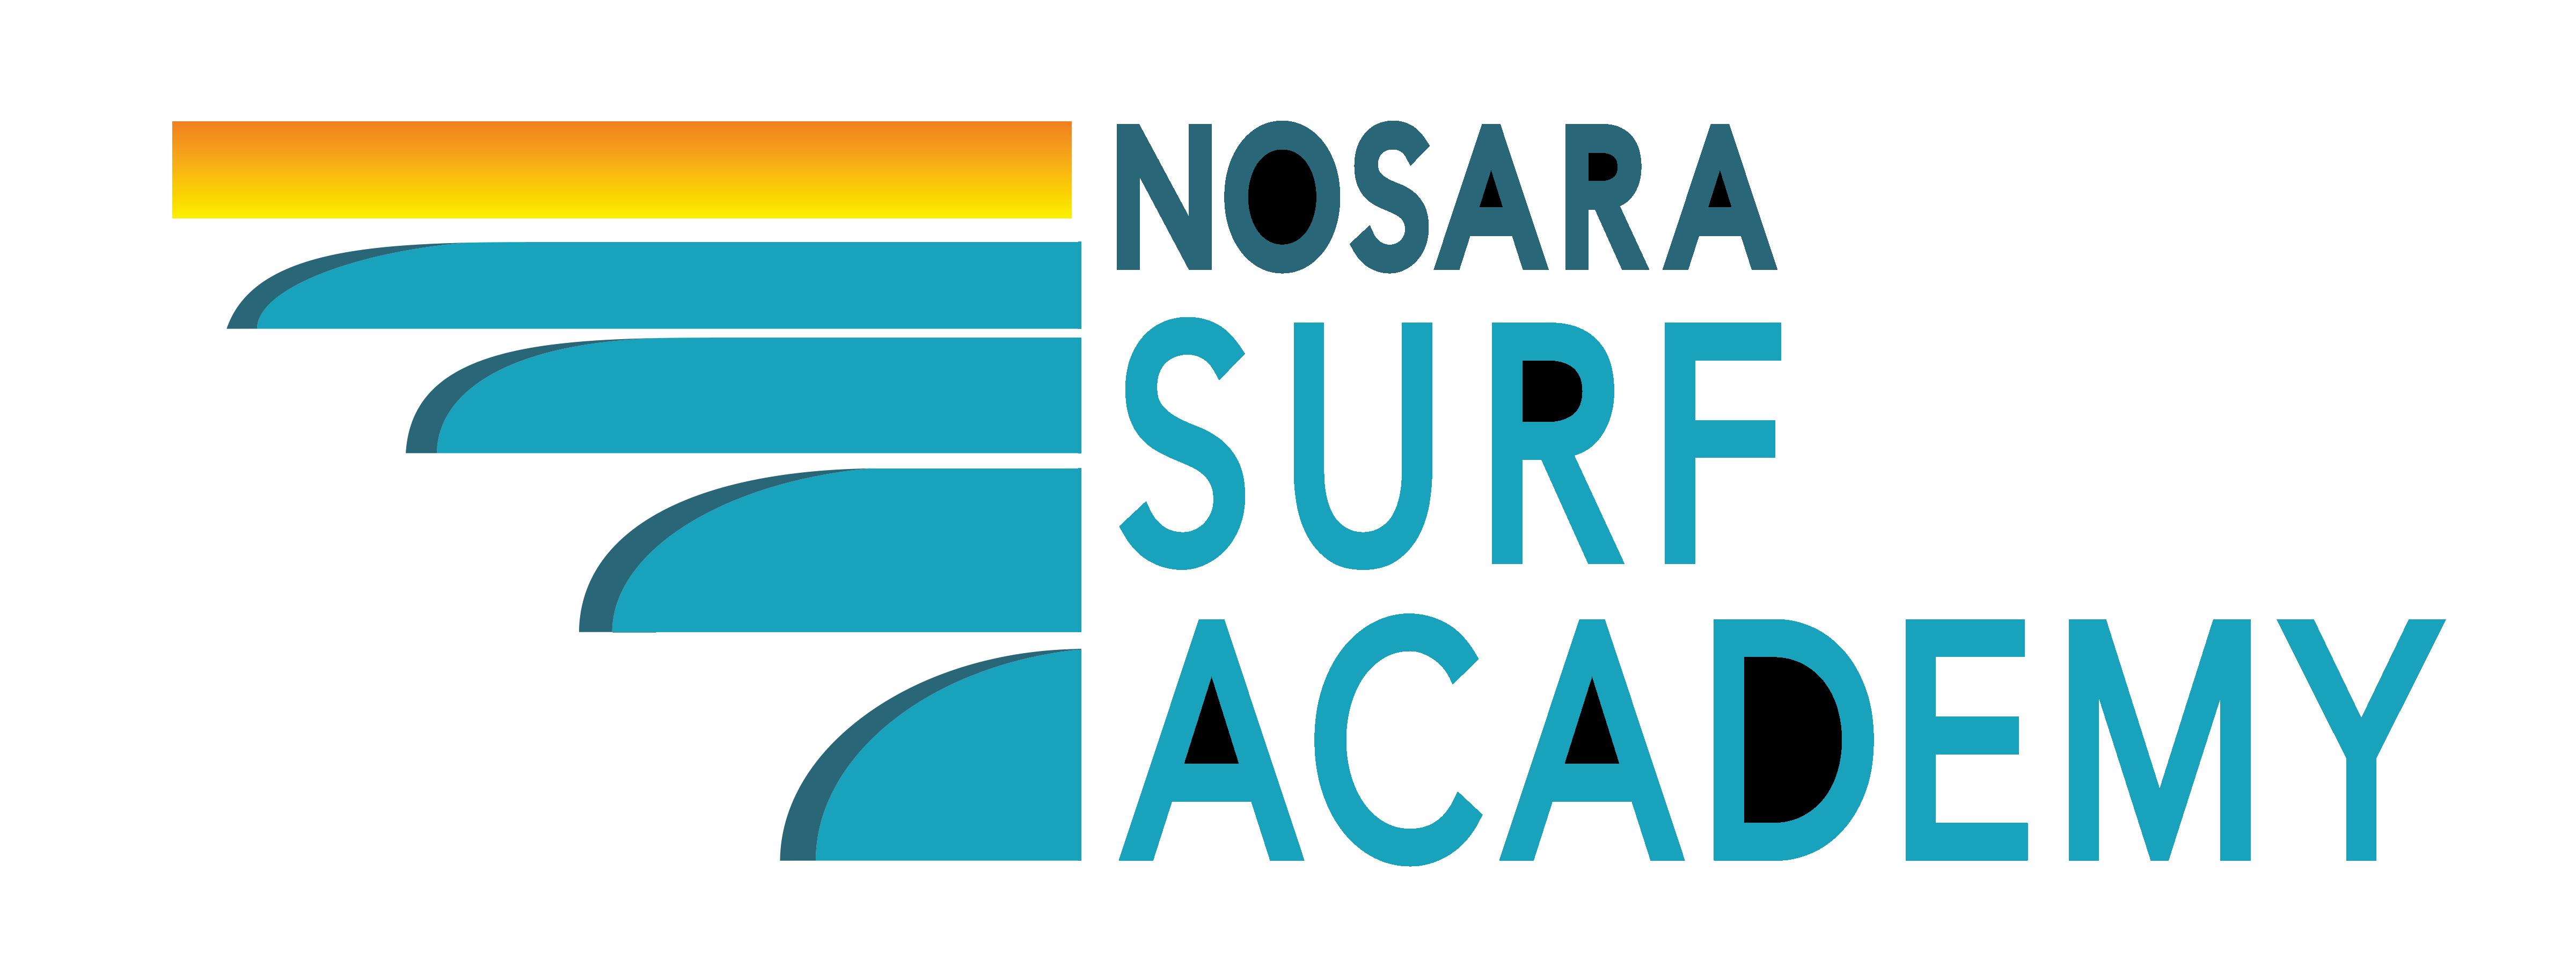 Nosara Surf Academy